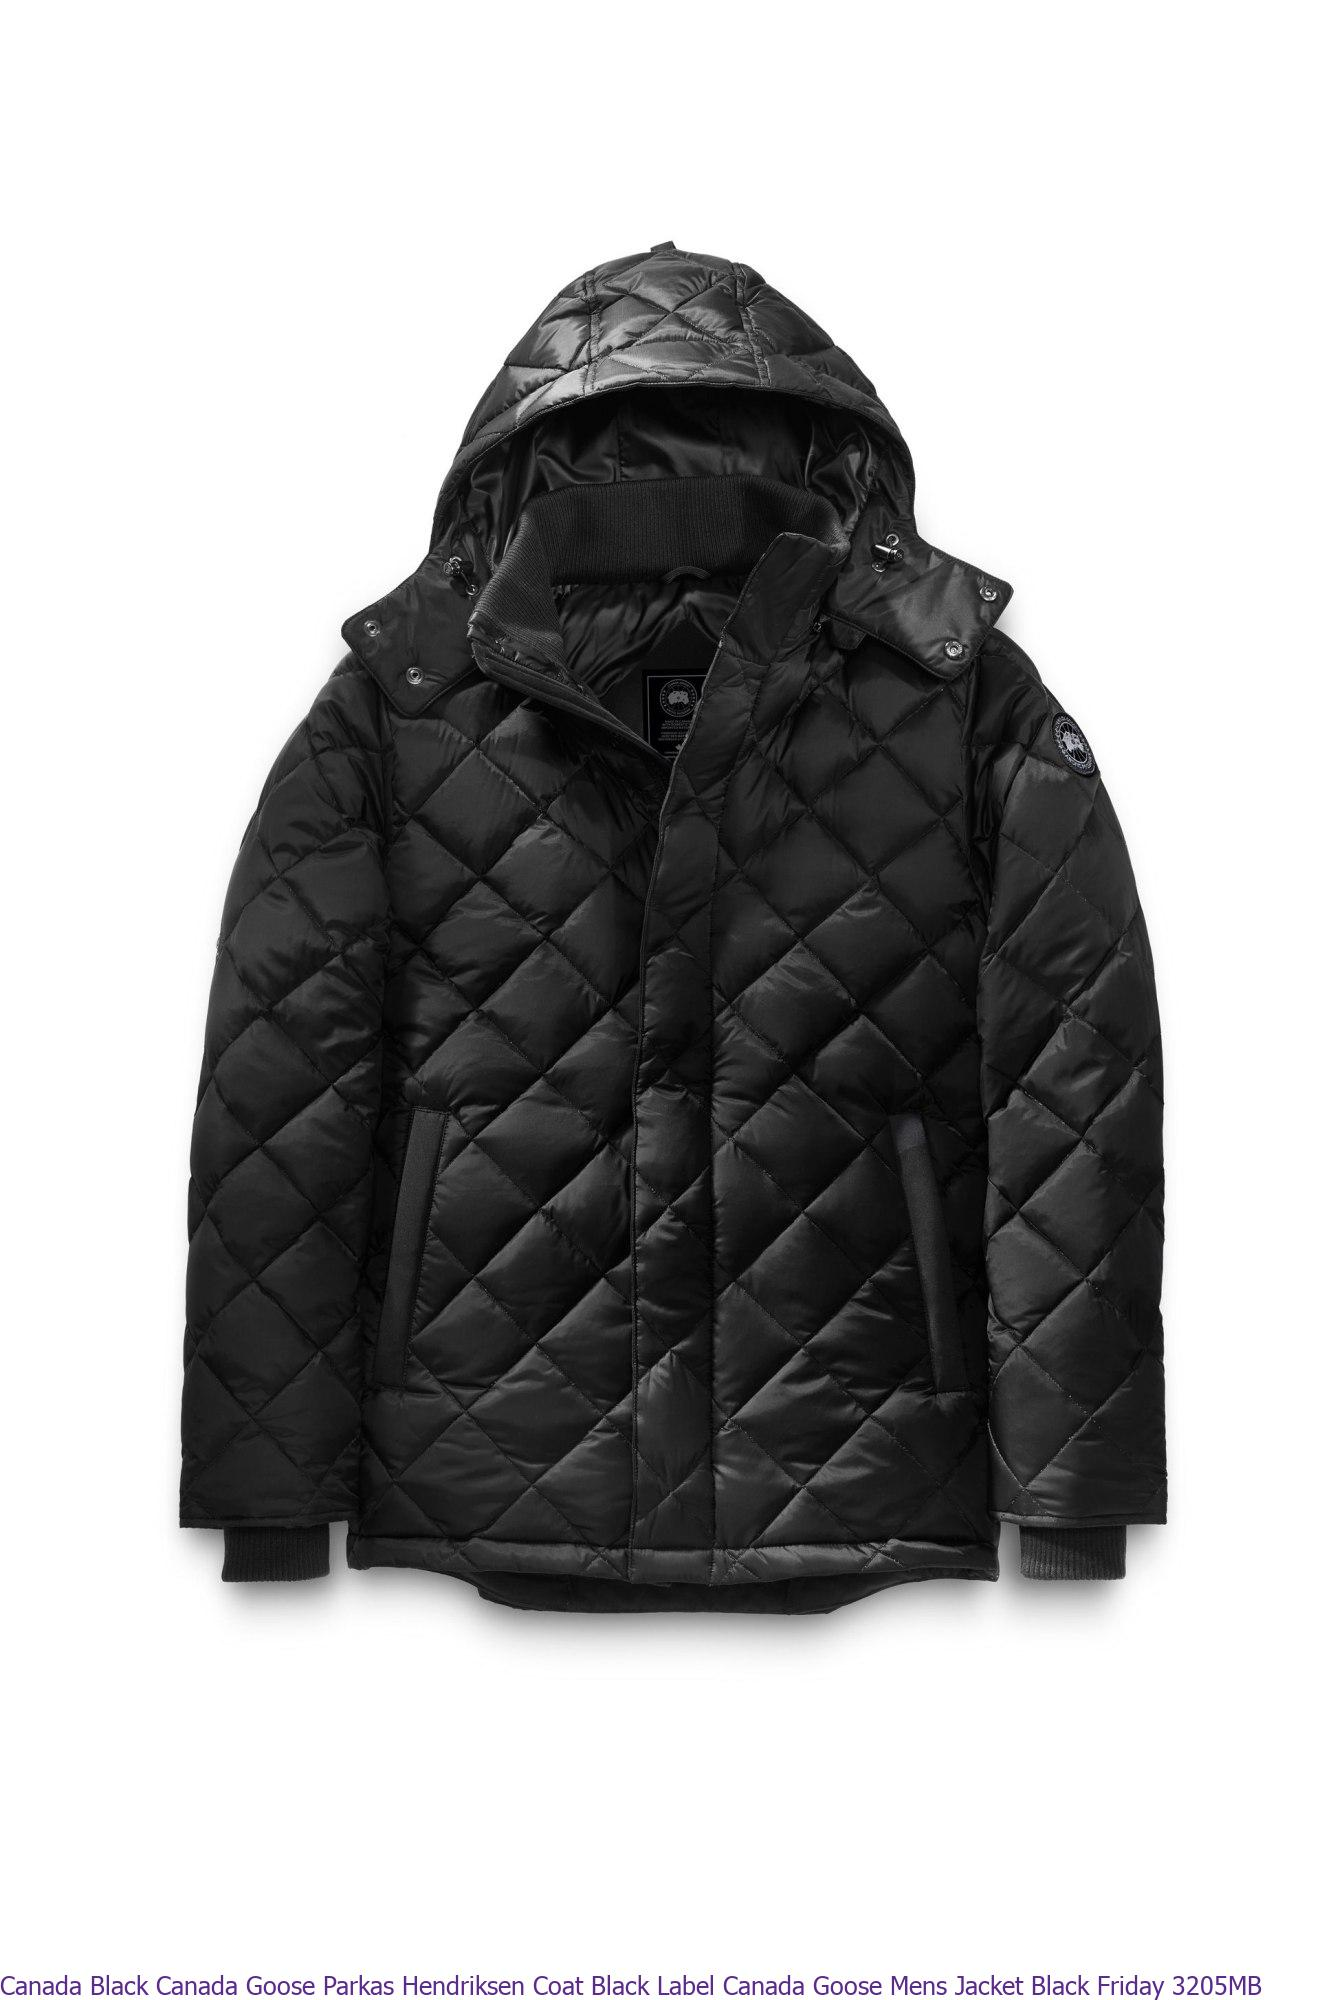 Canada Black Canada Goose Parkas Hendriksen Coat Black